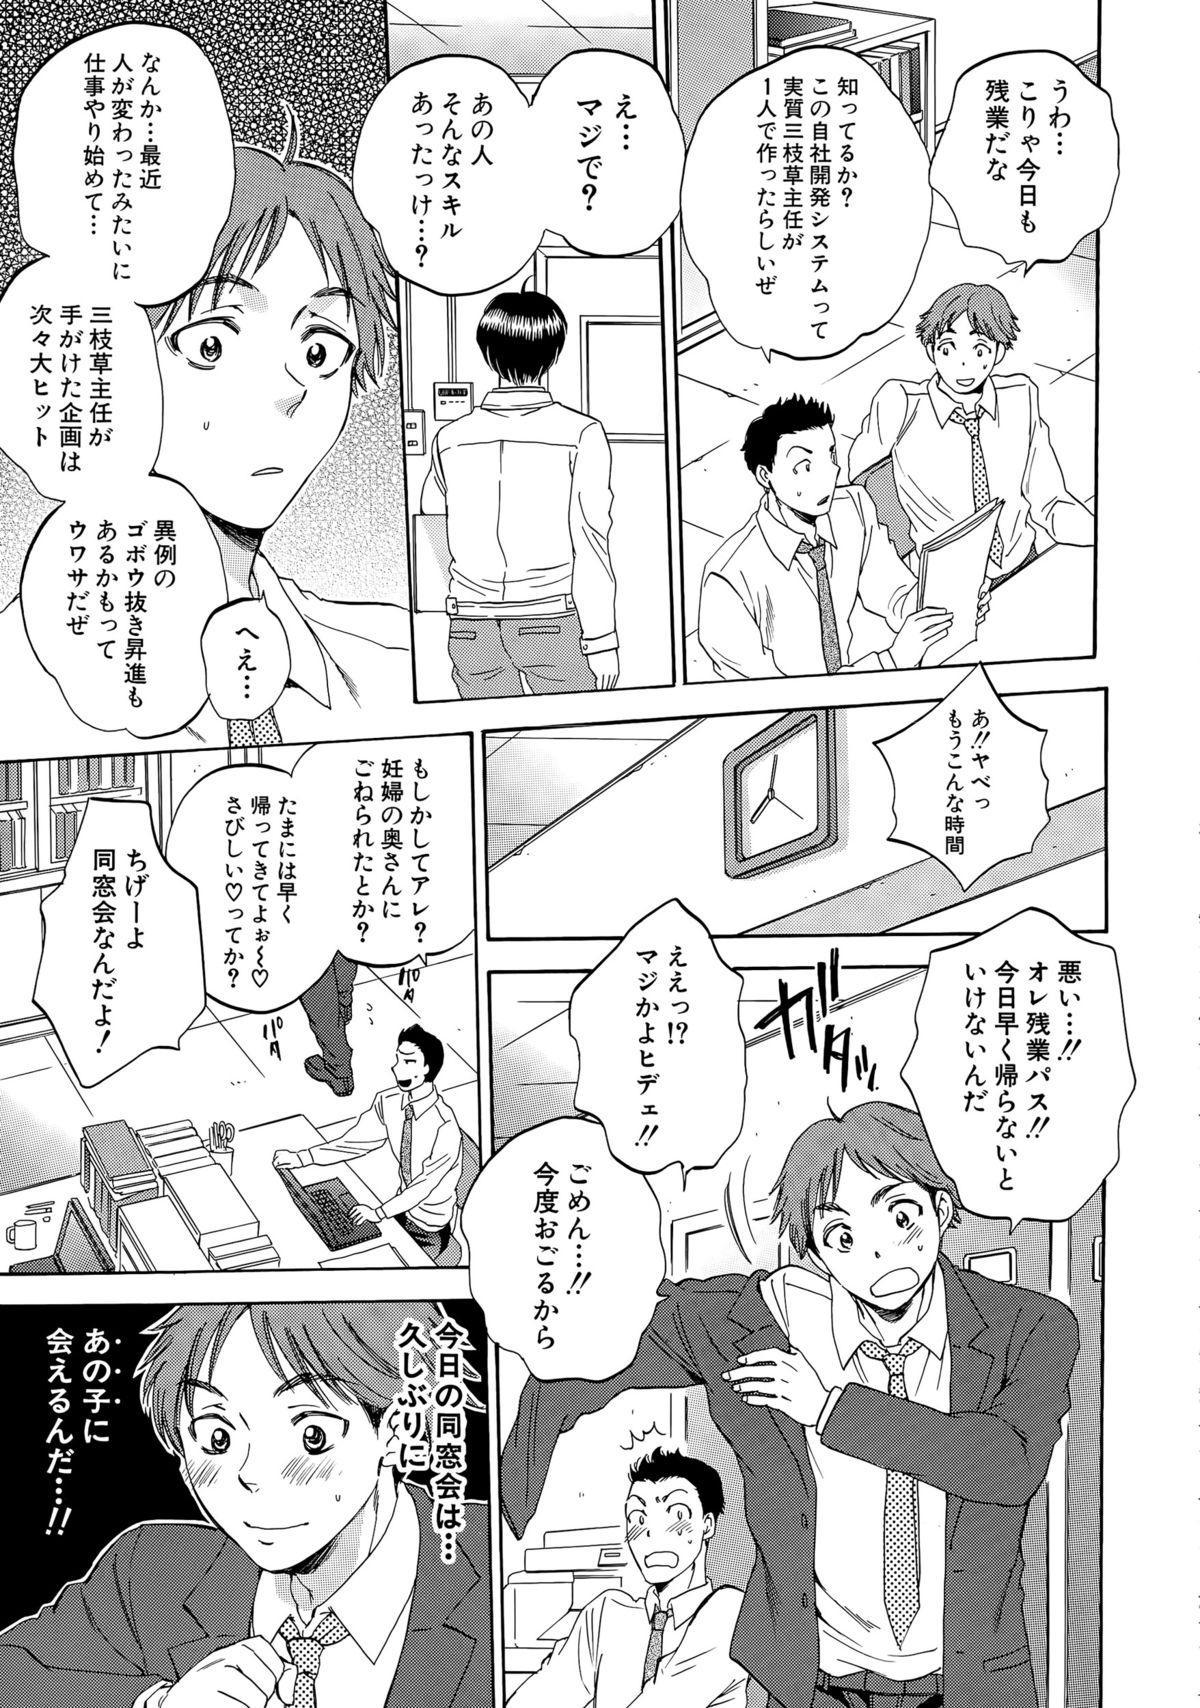 COMIC Mugen Tensei 2015-05 261